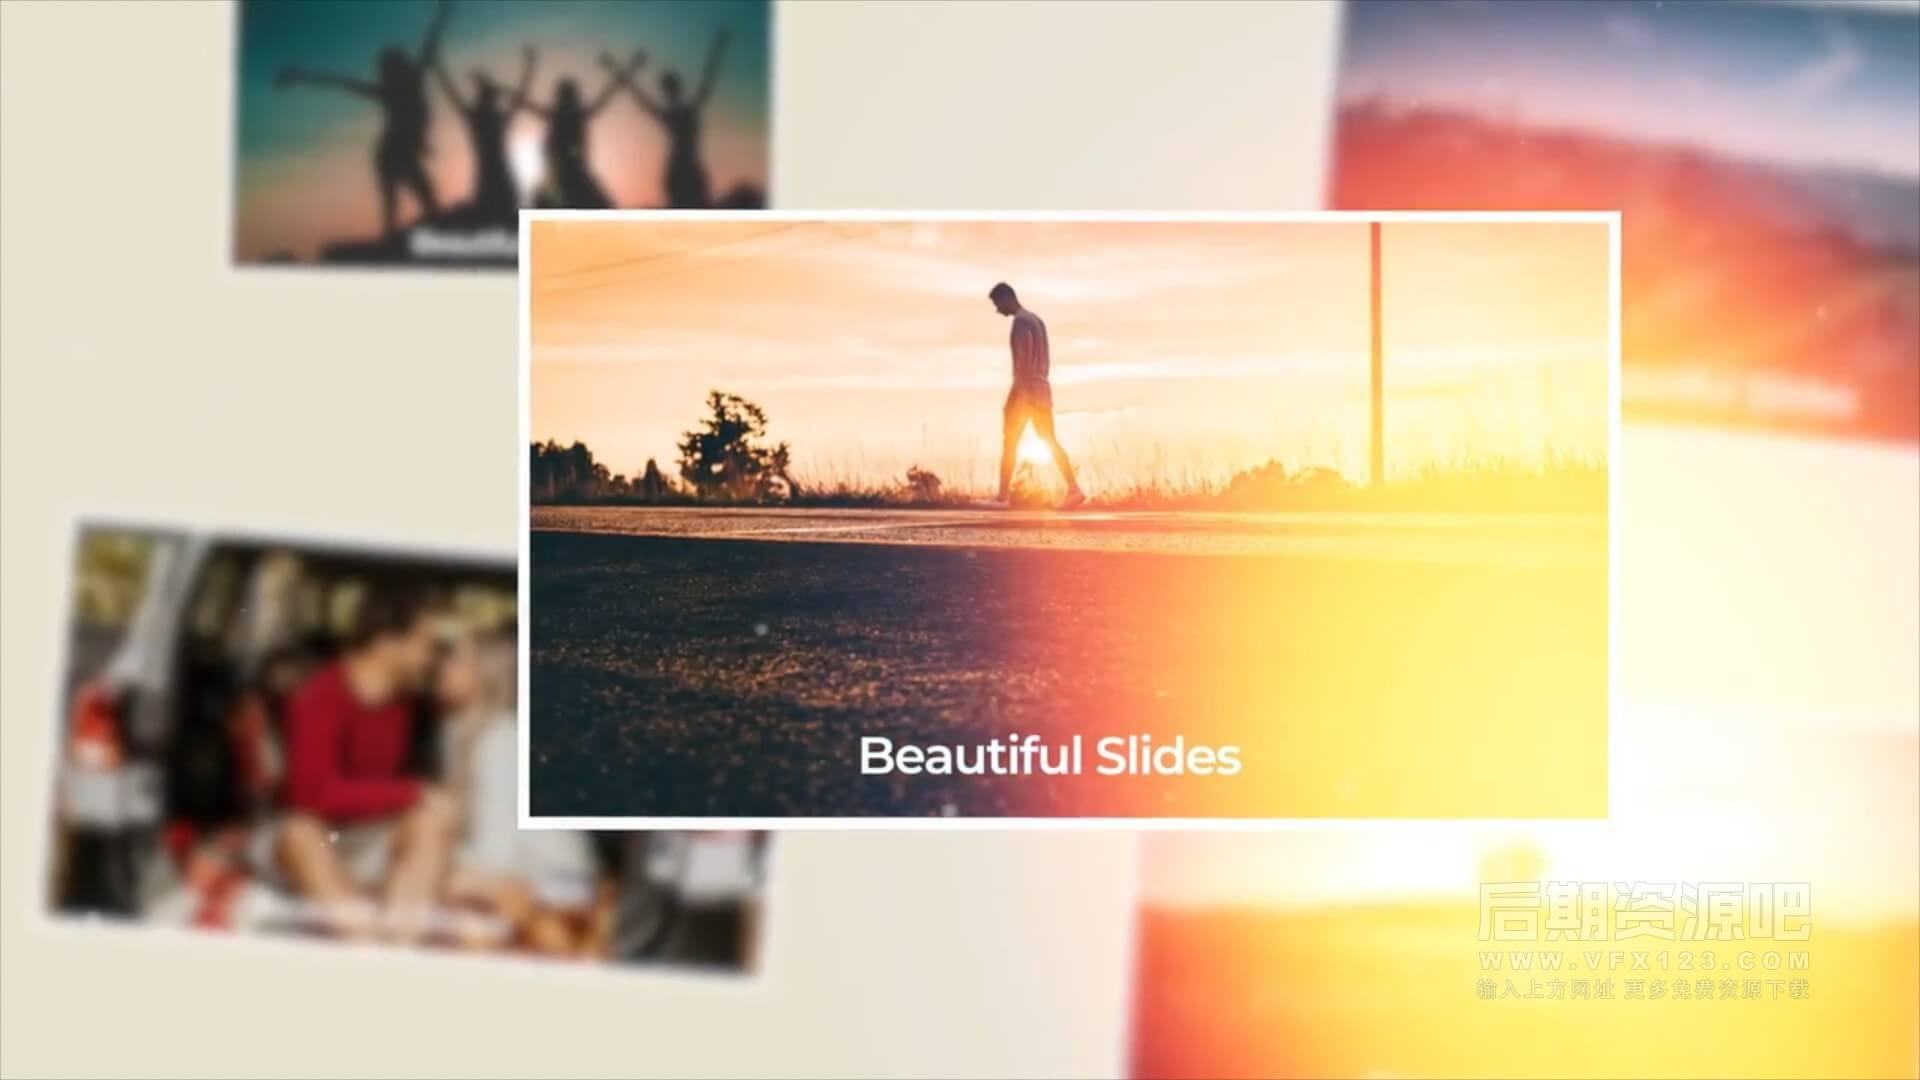 fcpx主题模板 时尚旅行假日家庭电子相册展示模板 Beautiful Slides